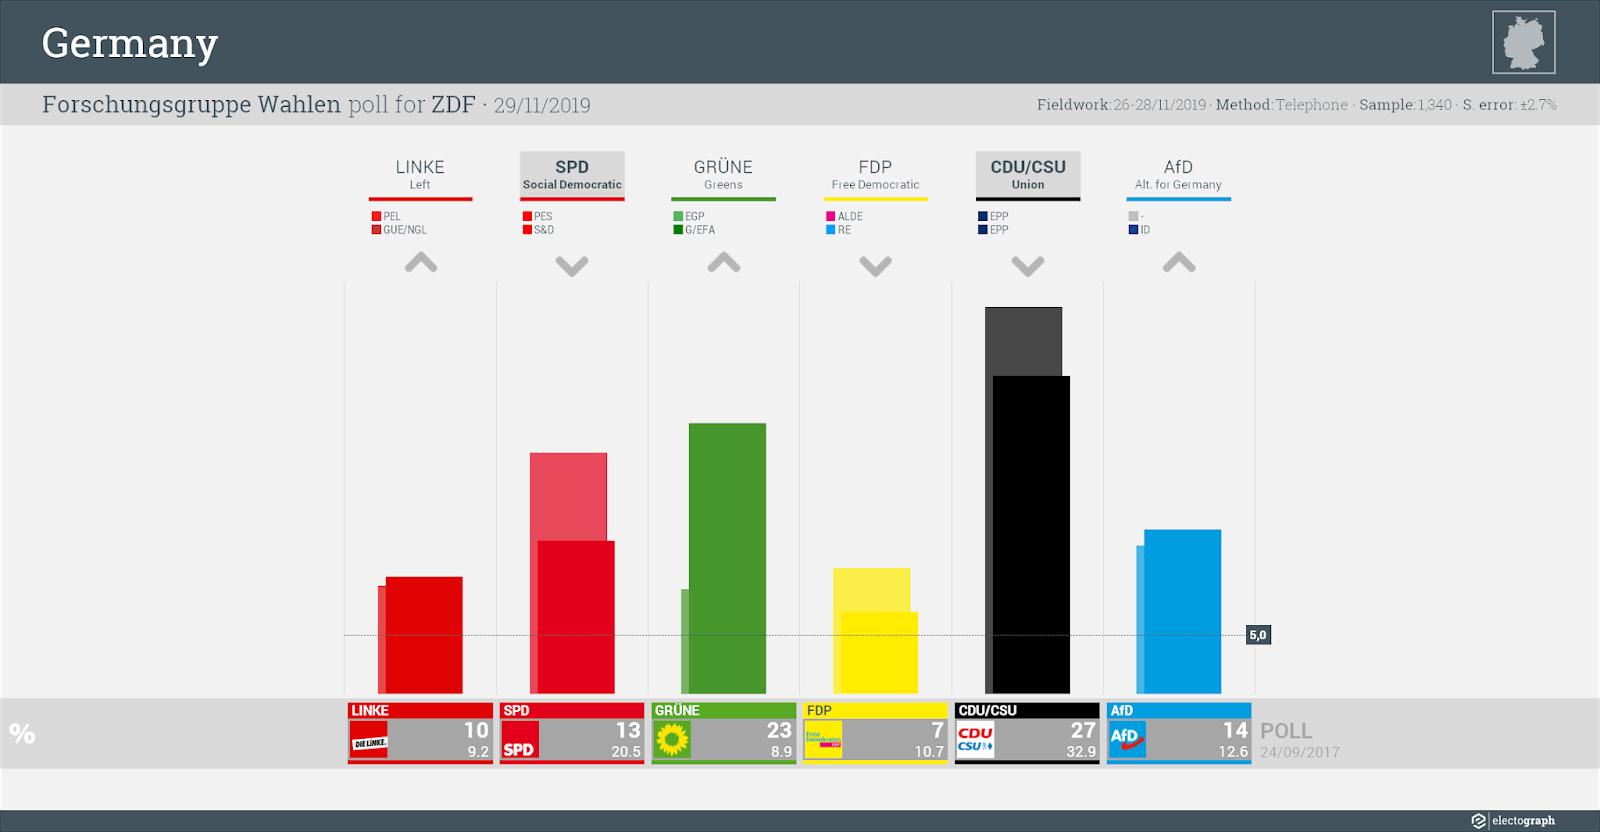 GERMANY: Forschungsgruppe Wahlen poll chart for ZDF, 29 November 2019